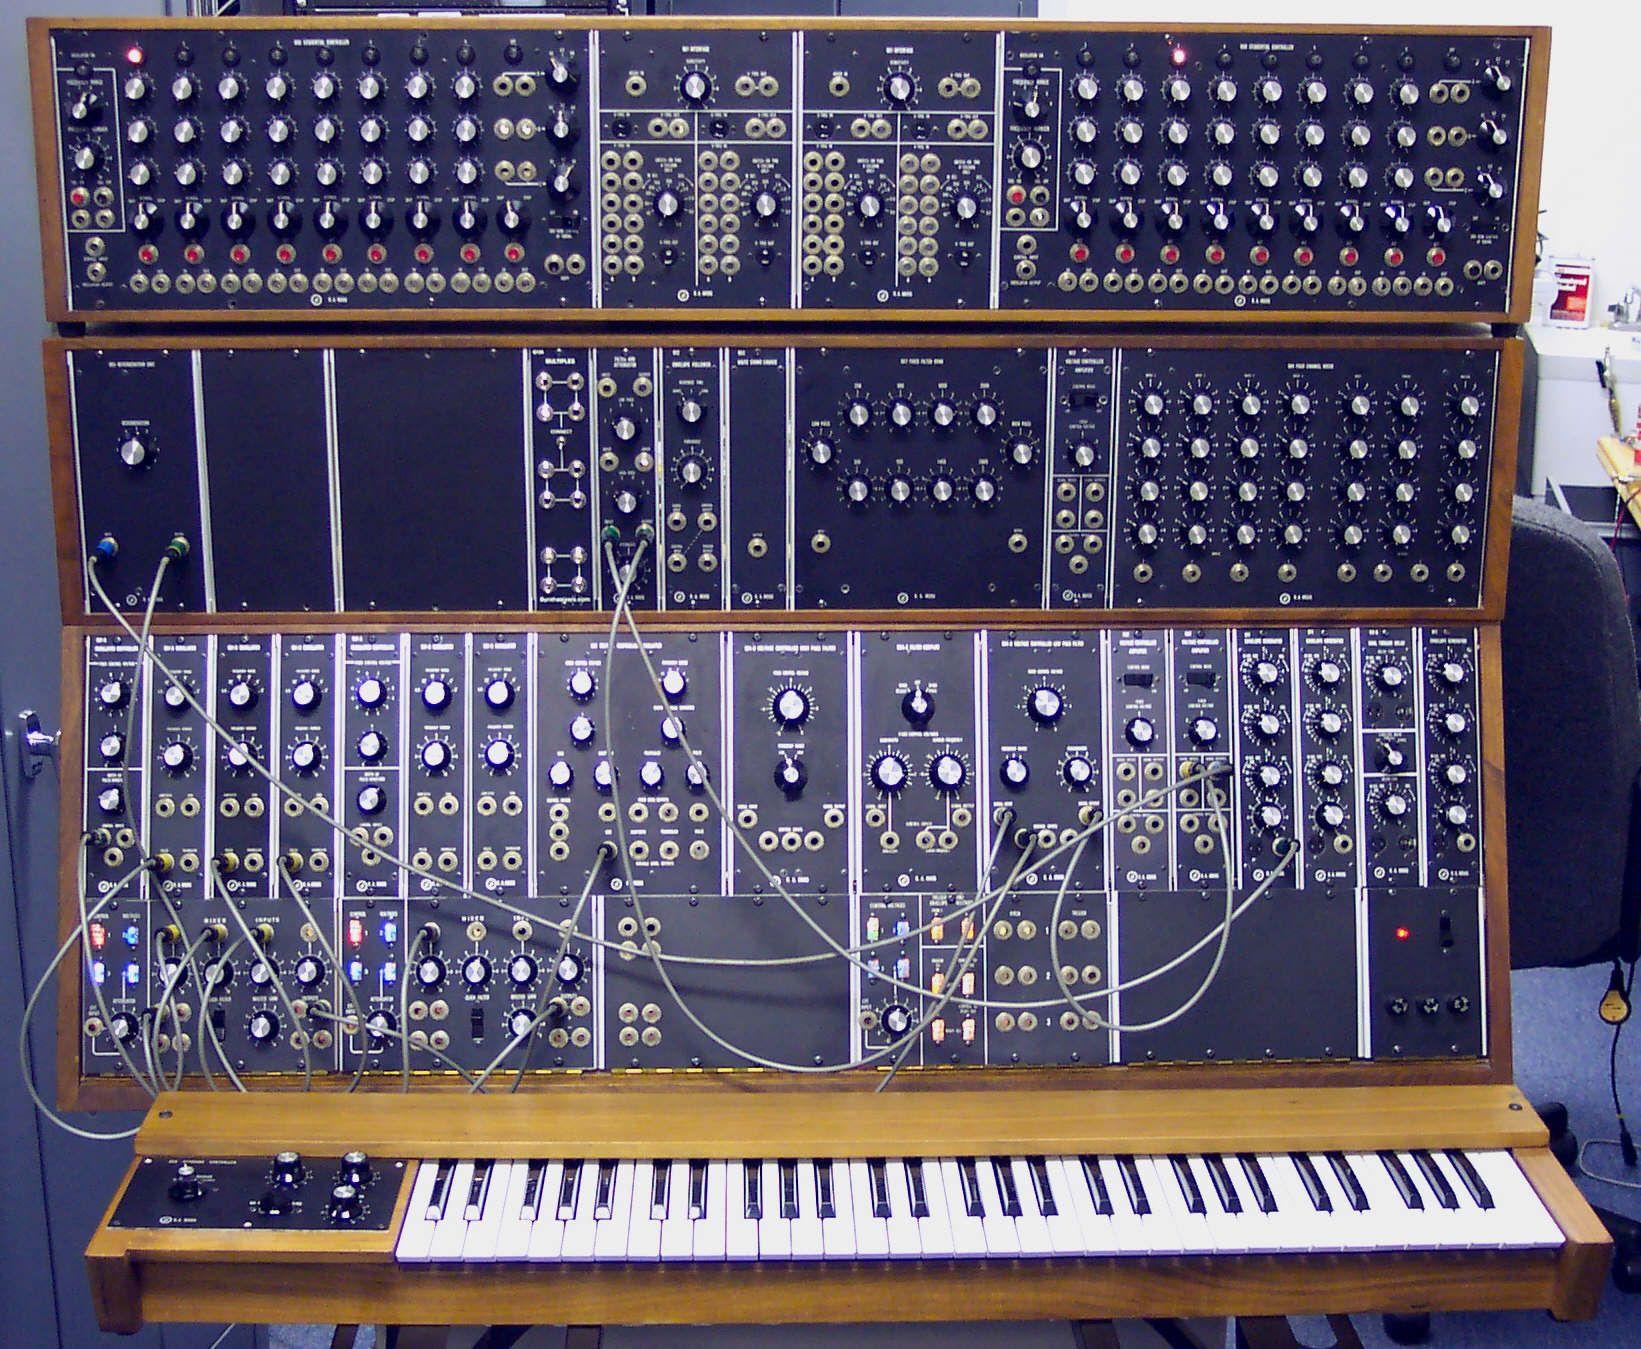 Moog Synthesizer 1c/2c/3c | Vintage Synth Explorer